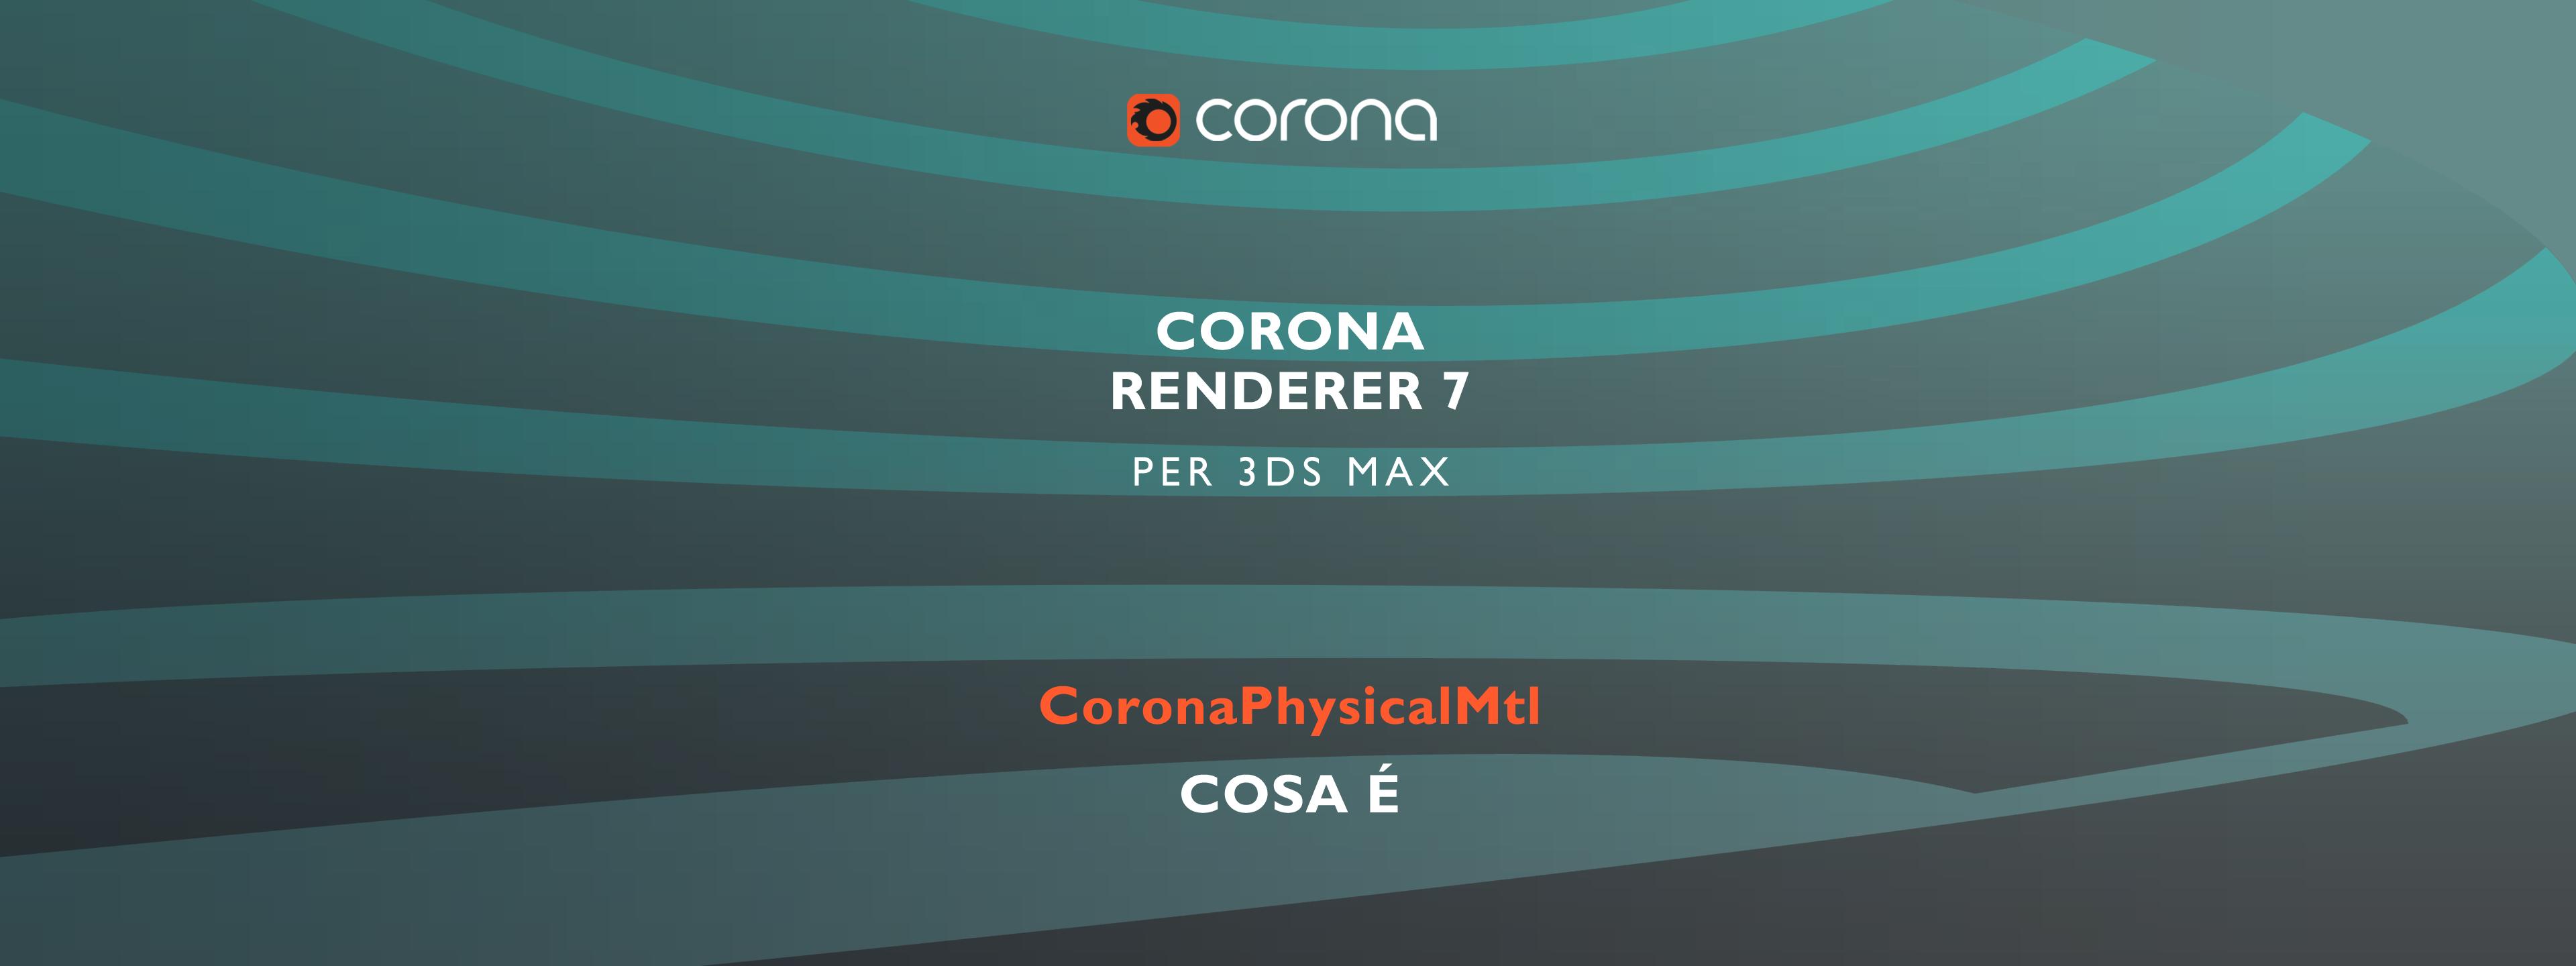 Blog_Thumb_26_Corona_7_PhysicalMtl_Explained_00_Cover_Mobile_ITA.png